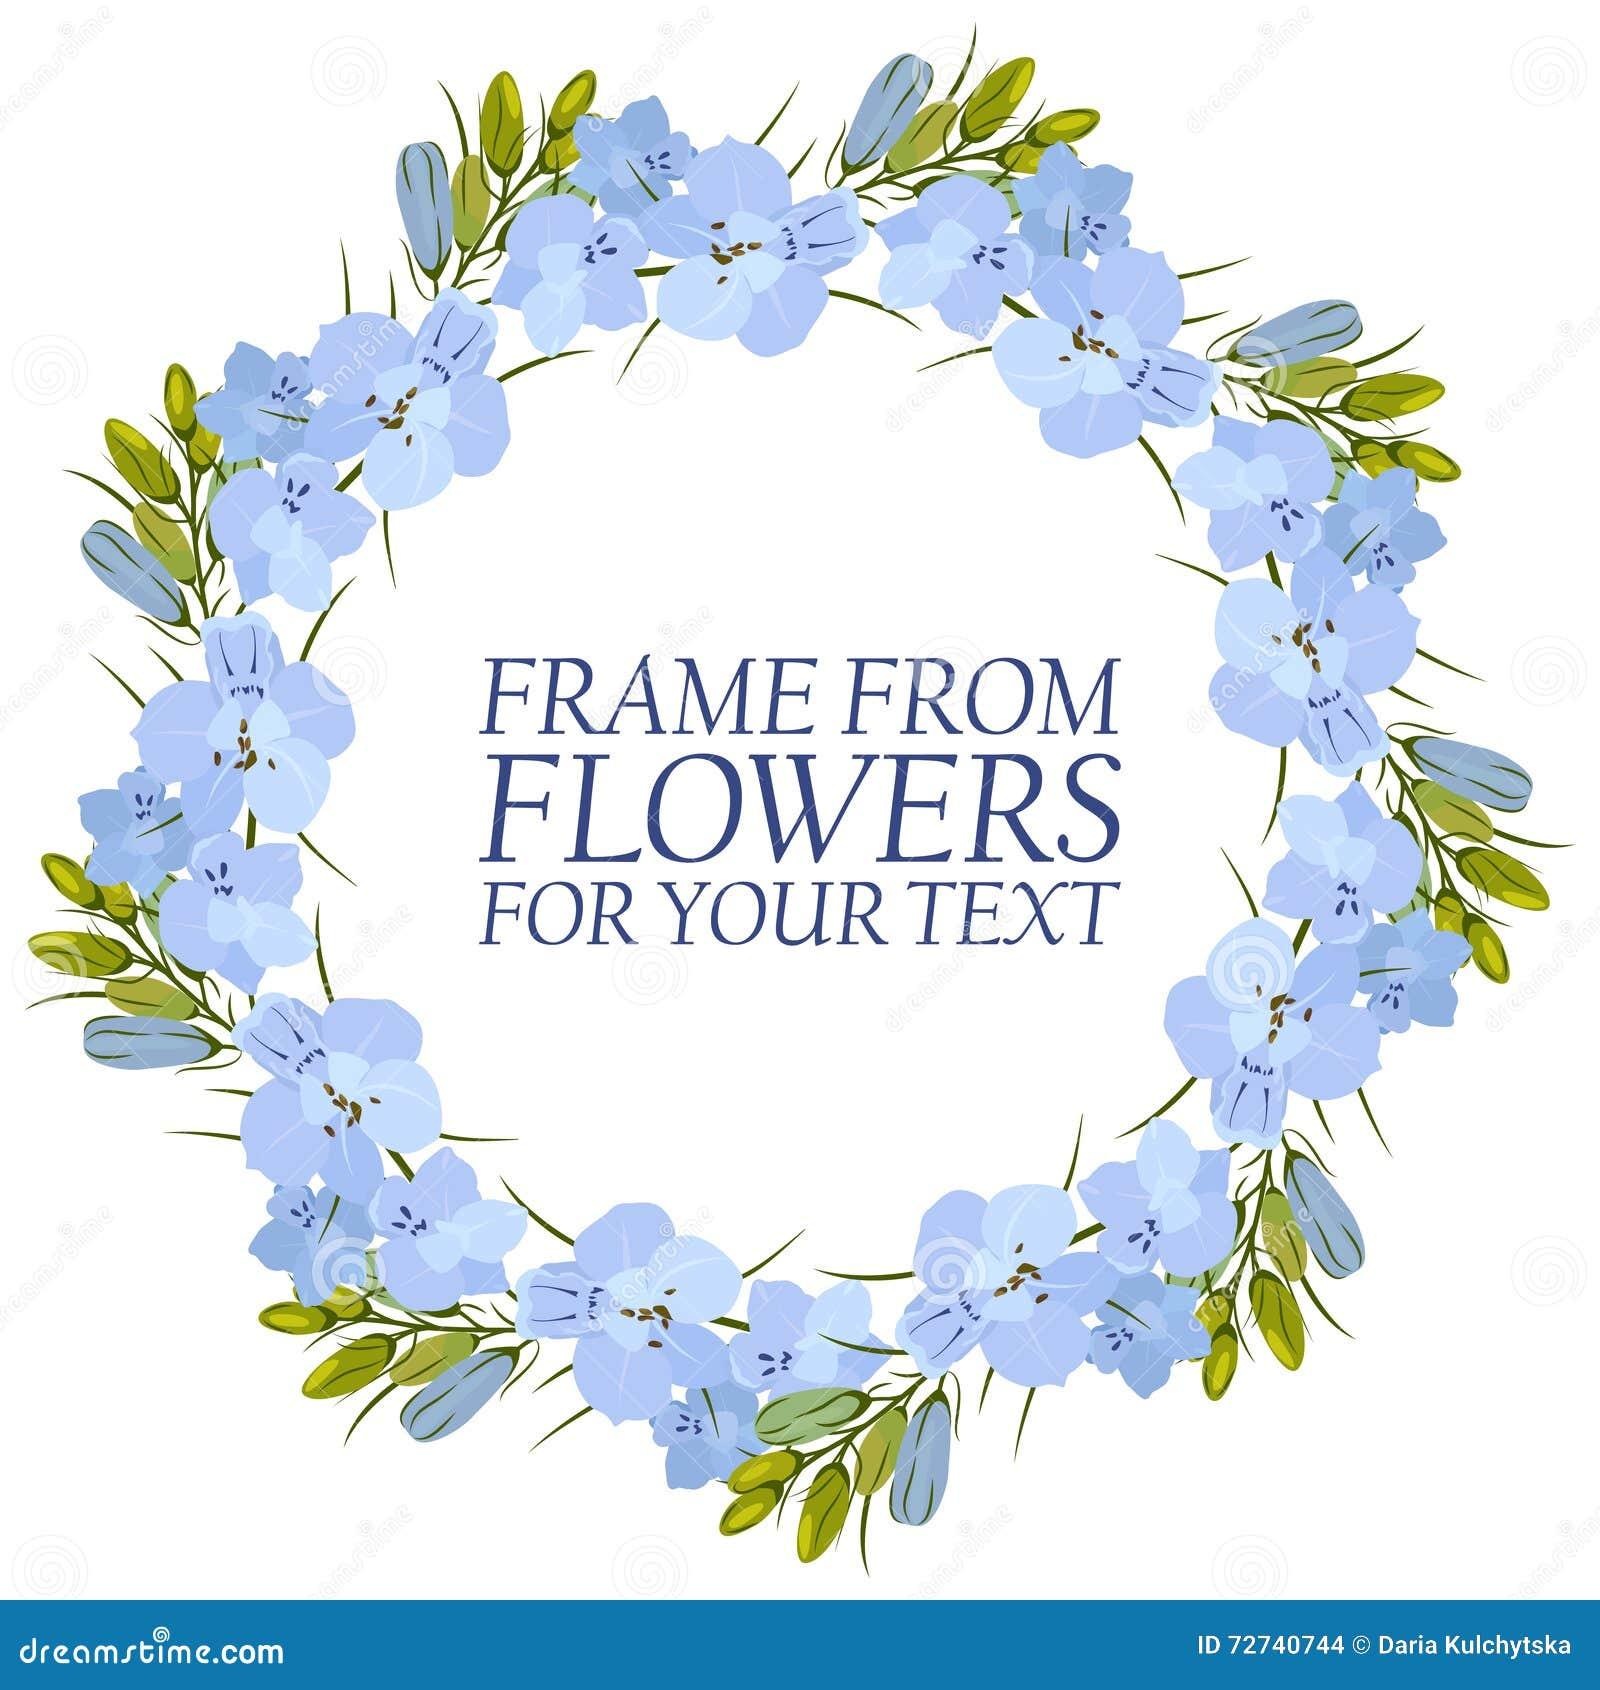 Frame of flowers for text light blue flowers delphinium stock download frame of flowers for text light blue flowers delphinium stock vector illustration of izmirmasajfo